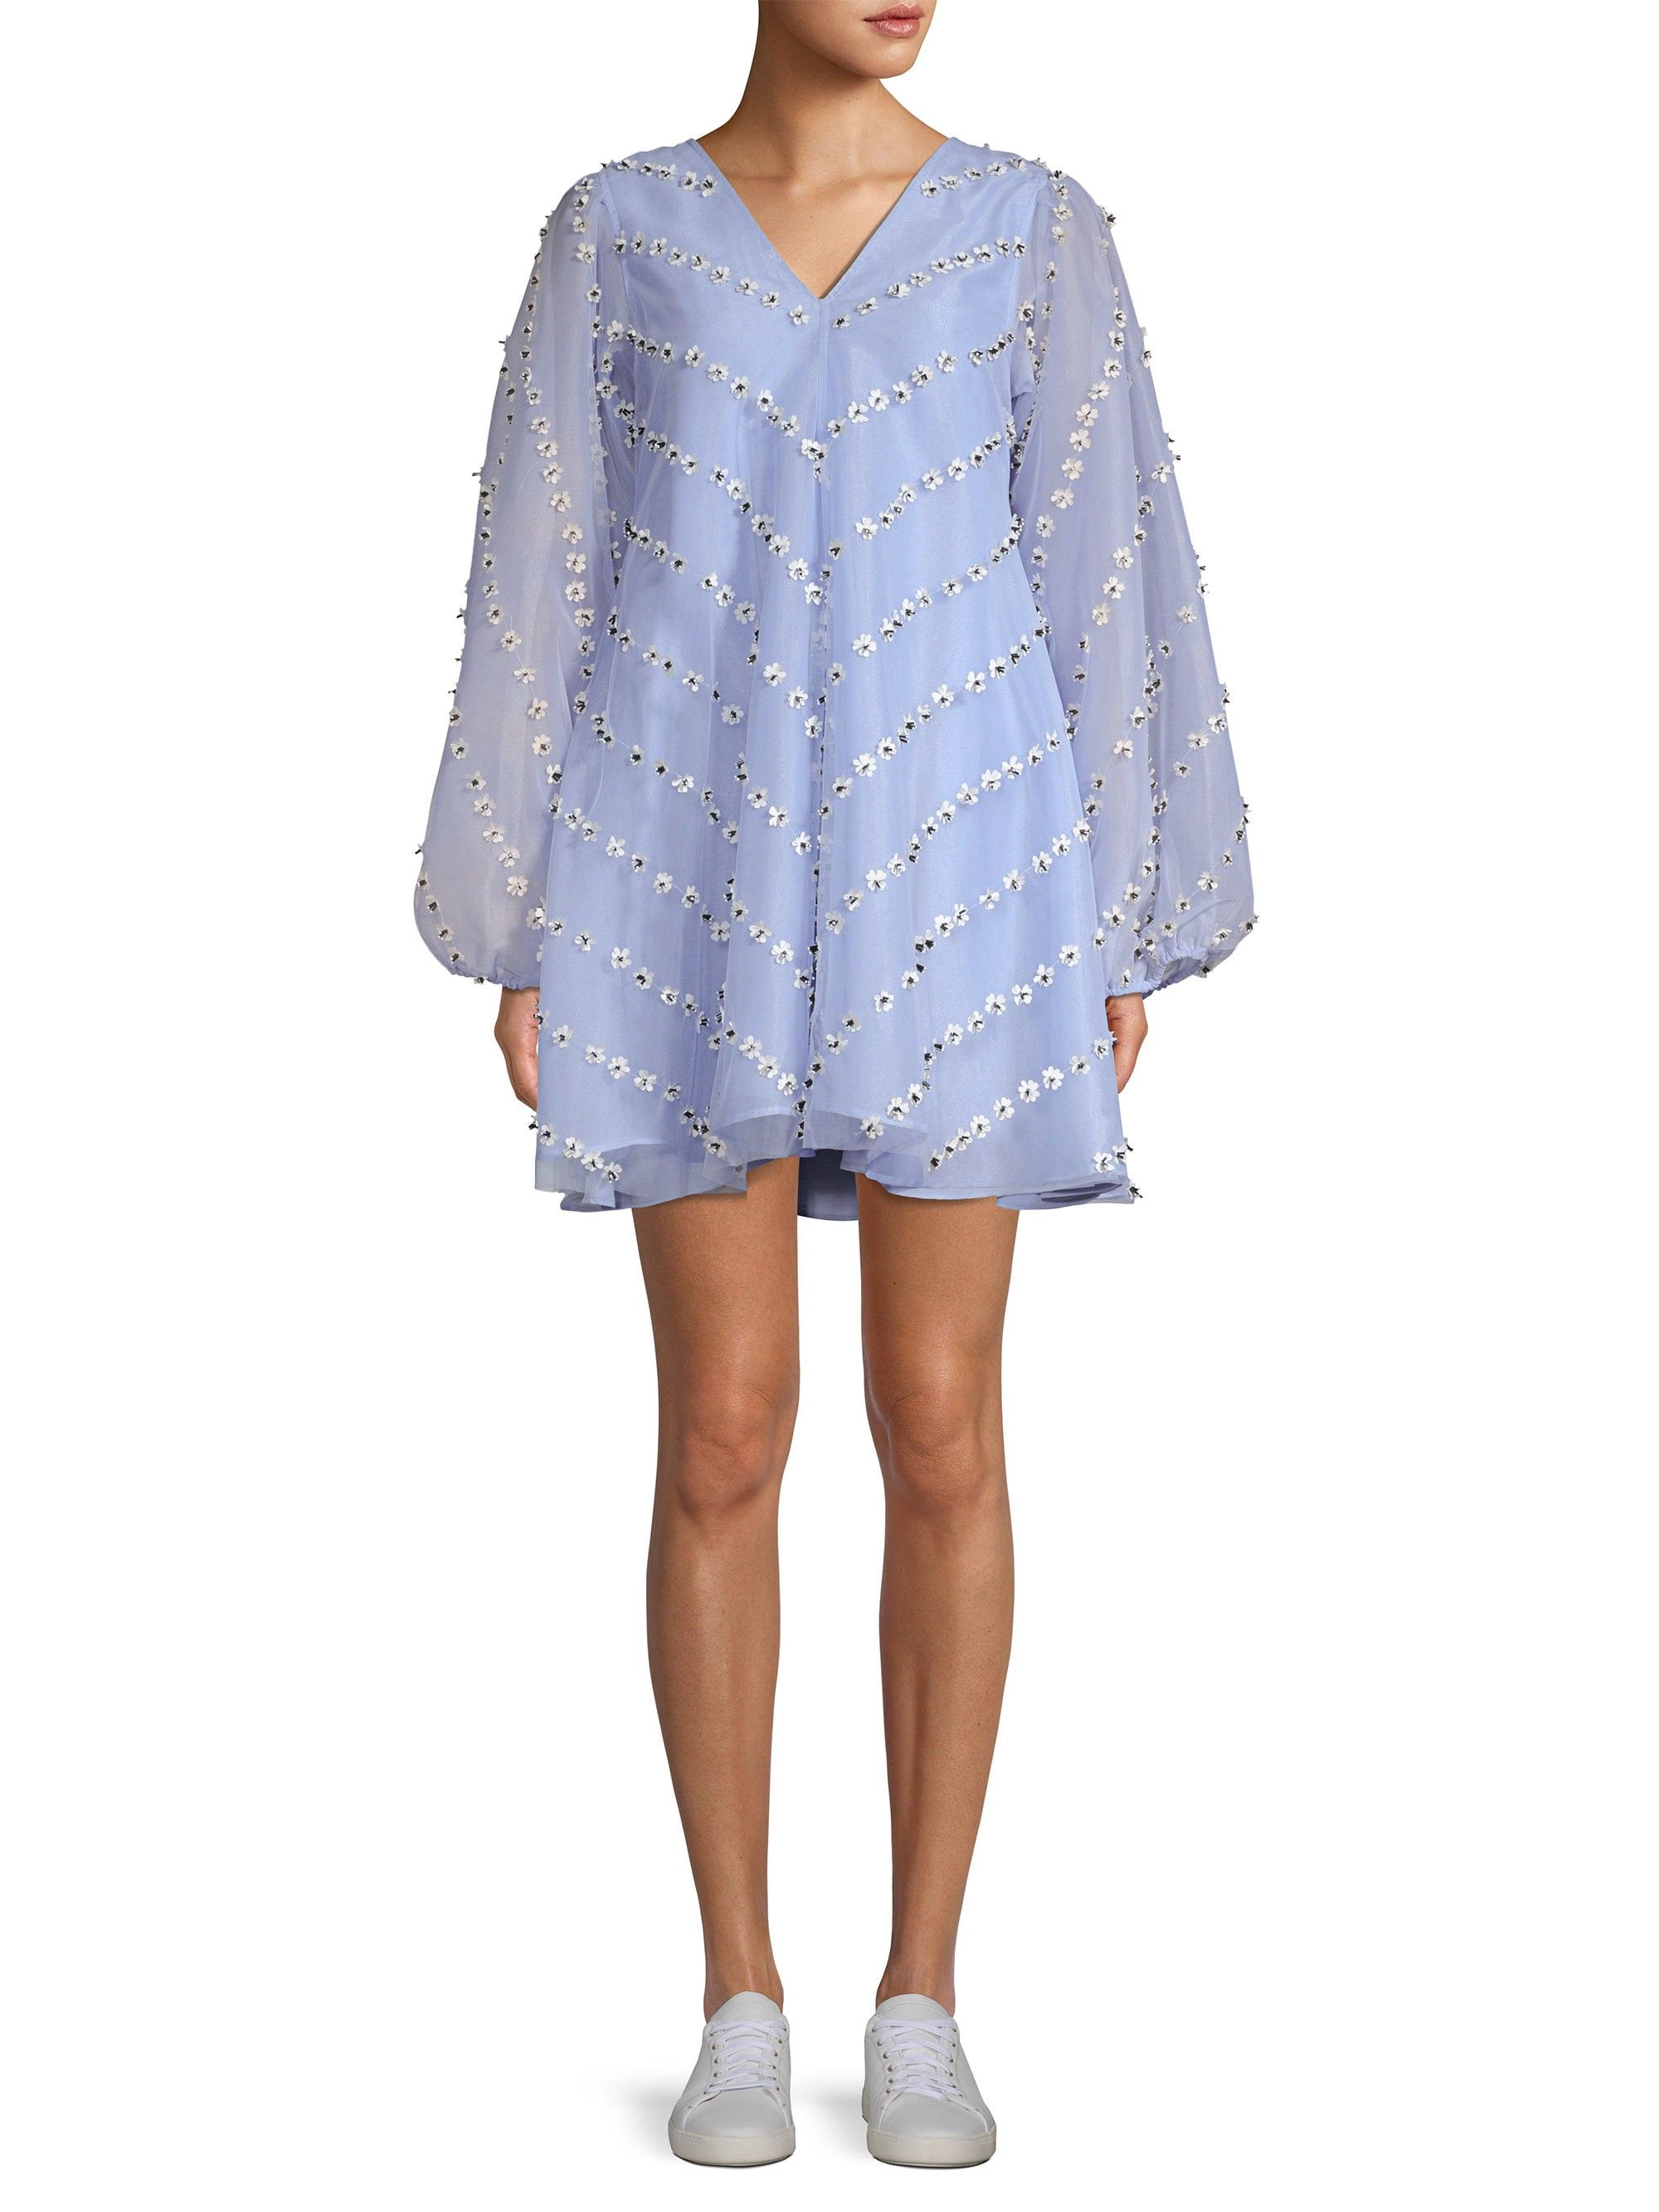 b3e1a6ca Ganni Rosenfeld Daisy Appliqué Mini Trapeze Dress - Serenity Blue 42 (8)